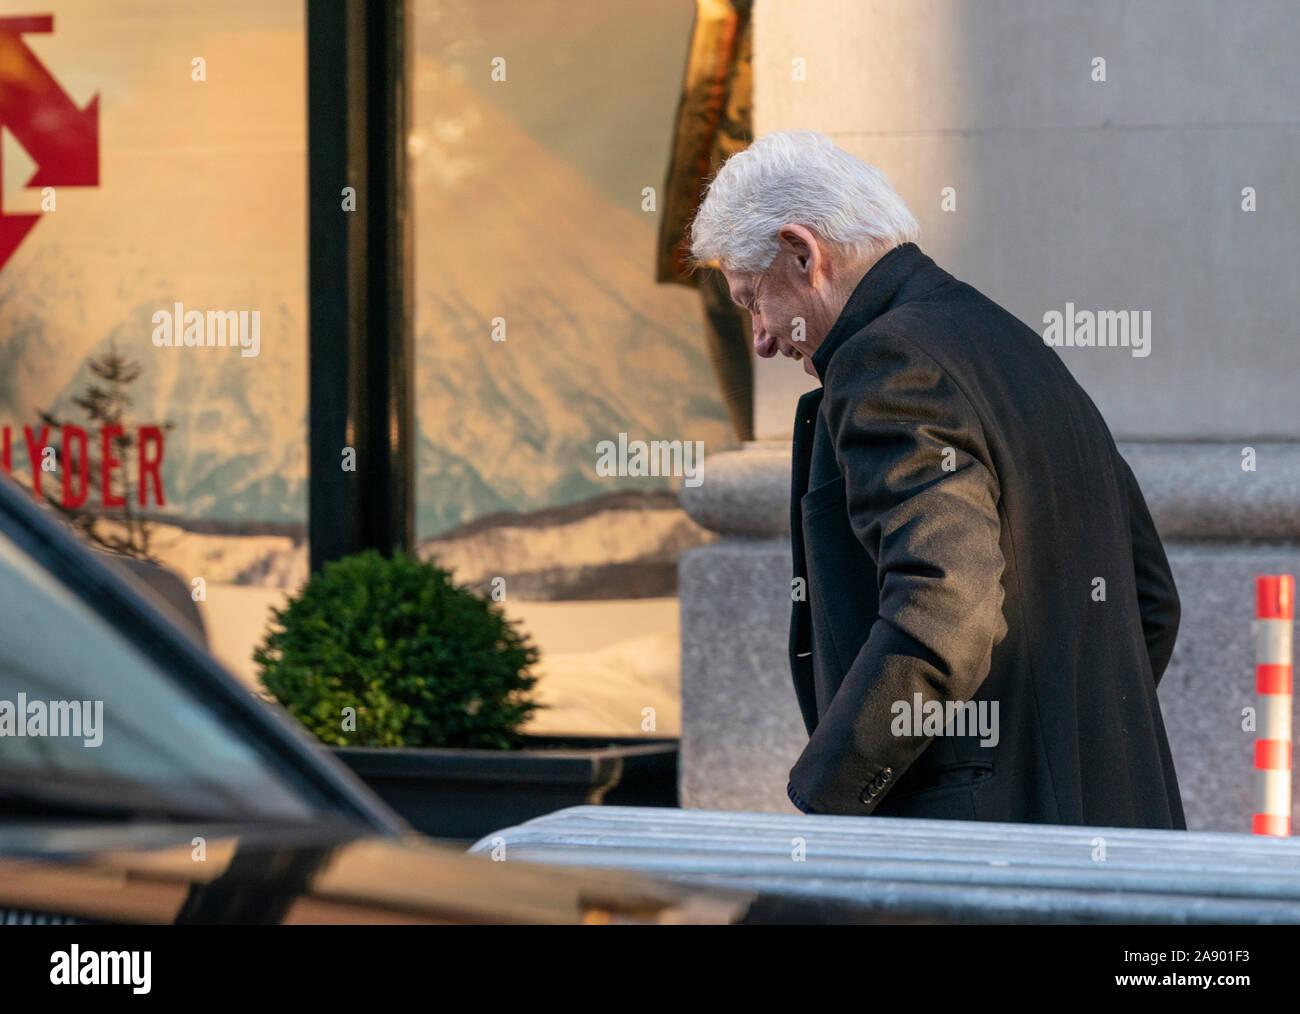 New York, NY - November 11, 2019: Former US President Bill Clinton arrives for breakfast at Blackbarn restaurant Stock Photo